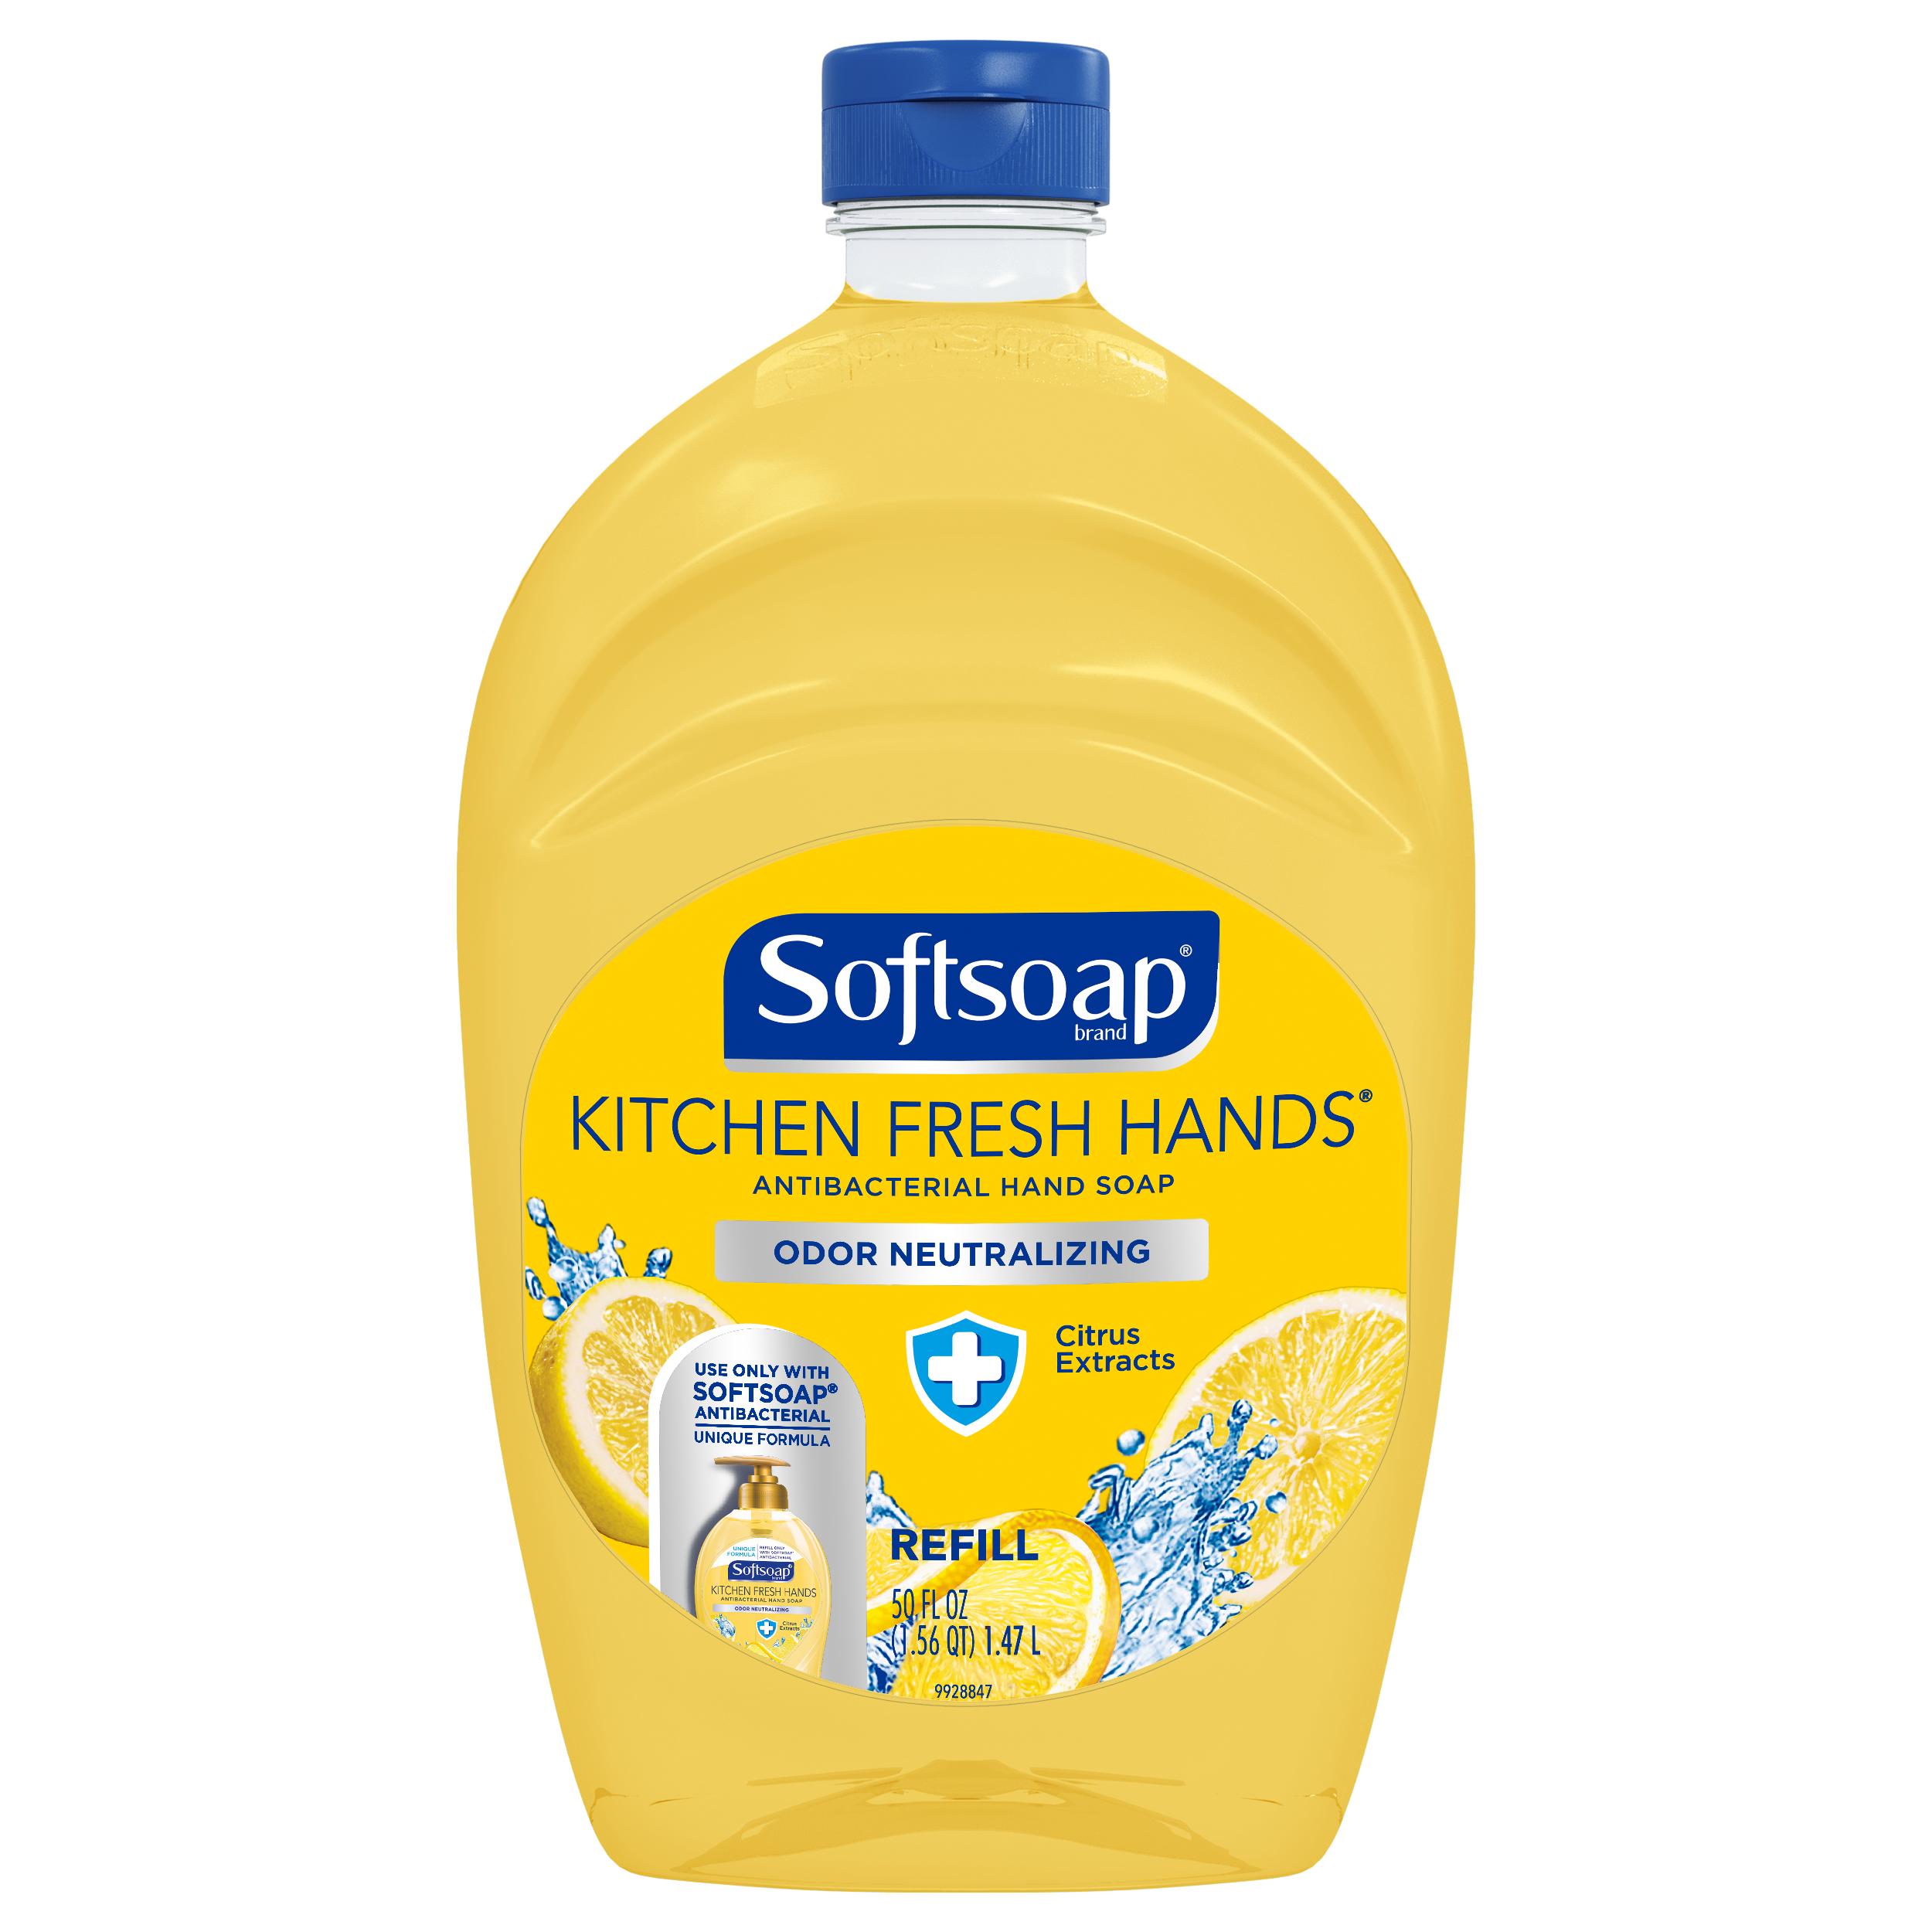 2 Pack Softsoap Antibacterial Hand Soap Refill Kitchen Fresh Hands 50 Oz Walmart Com Softsoap Liquid Hand Soap Kitchen Odor